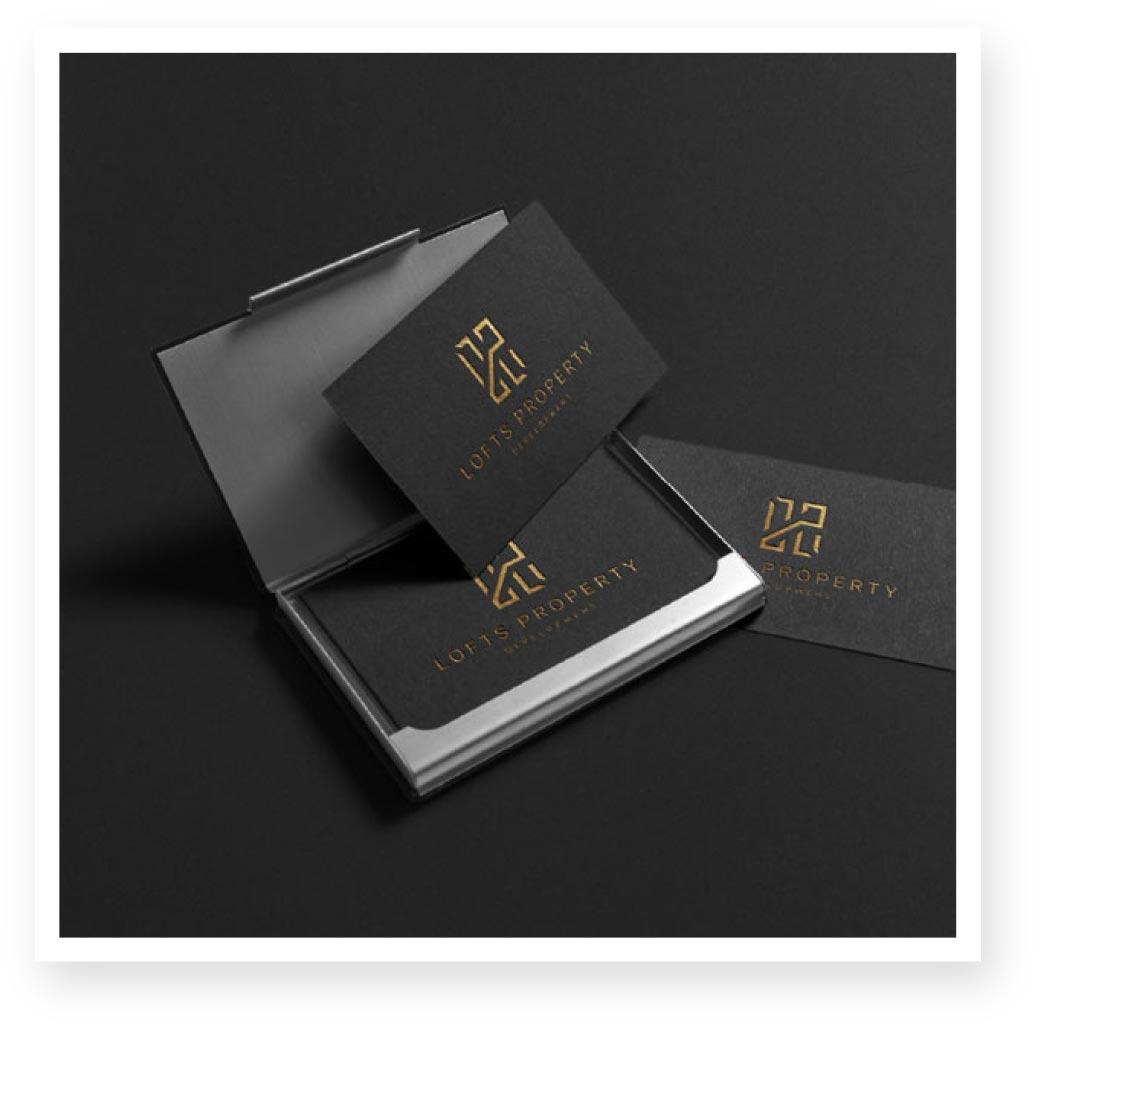 Lofts property development branding and business card design